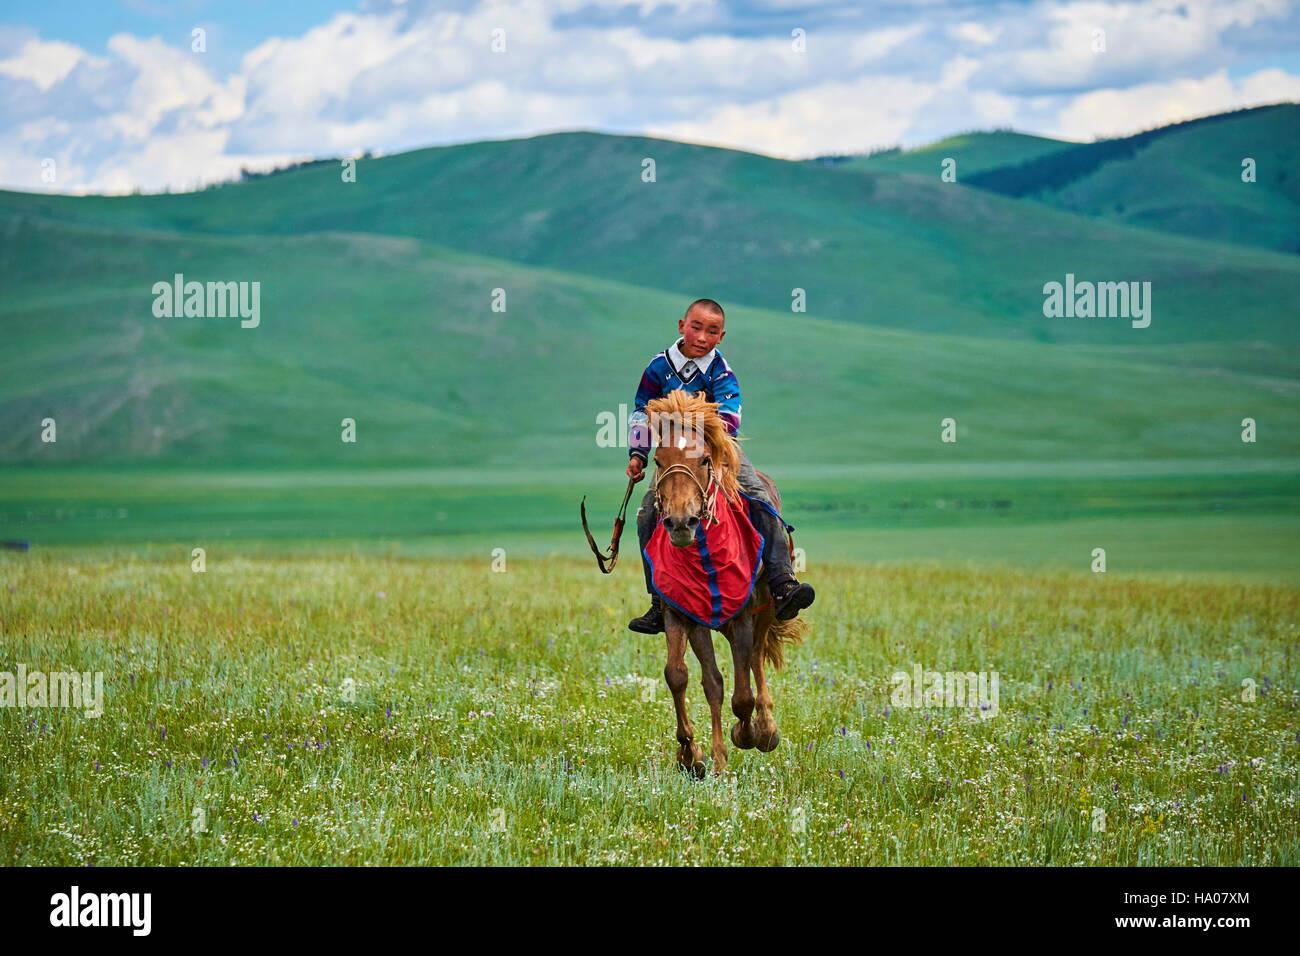 Mongolia, Bayankhongor province, Naadam, traditional festival, horse racing - Stock Image